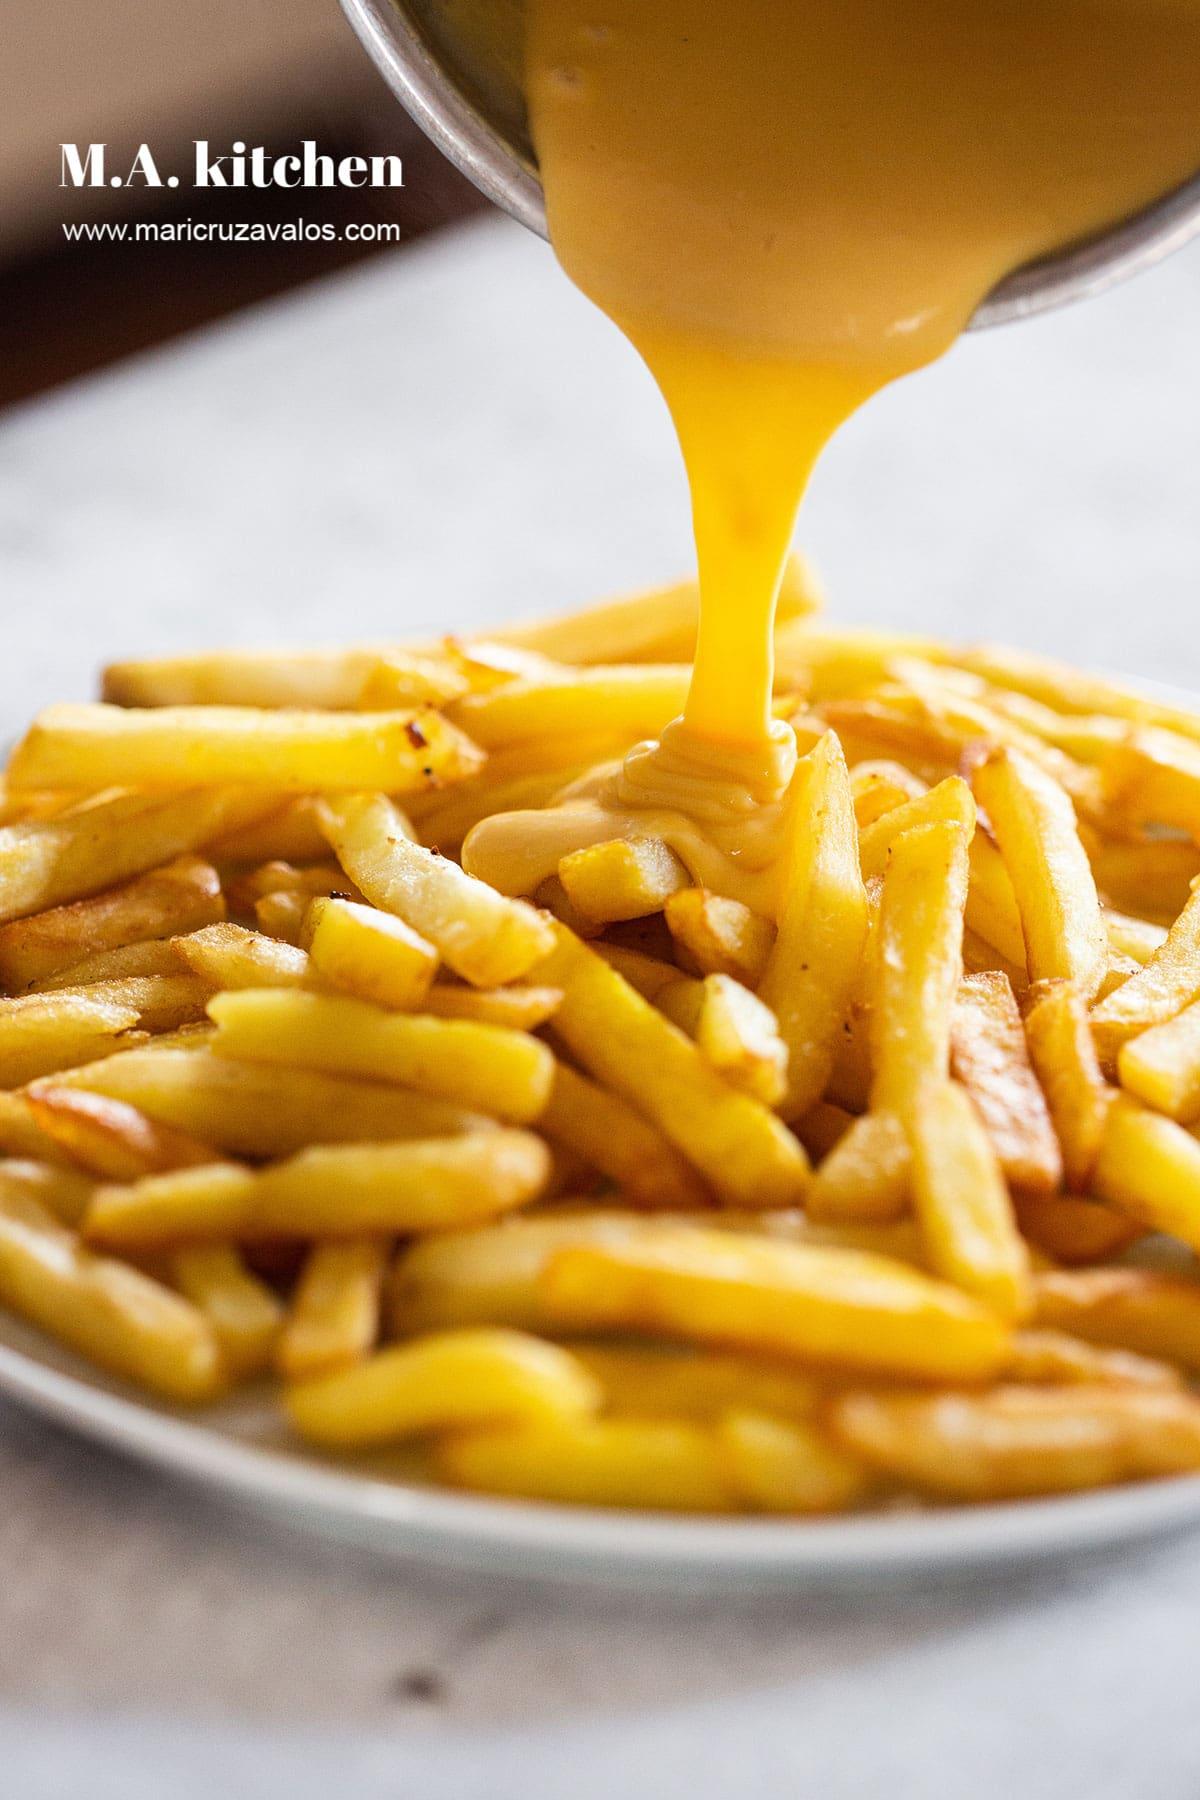 Adding cheese sauce over potato fries.